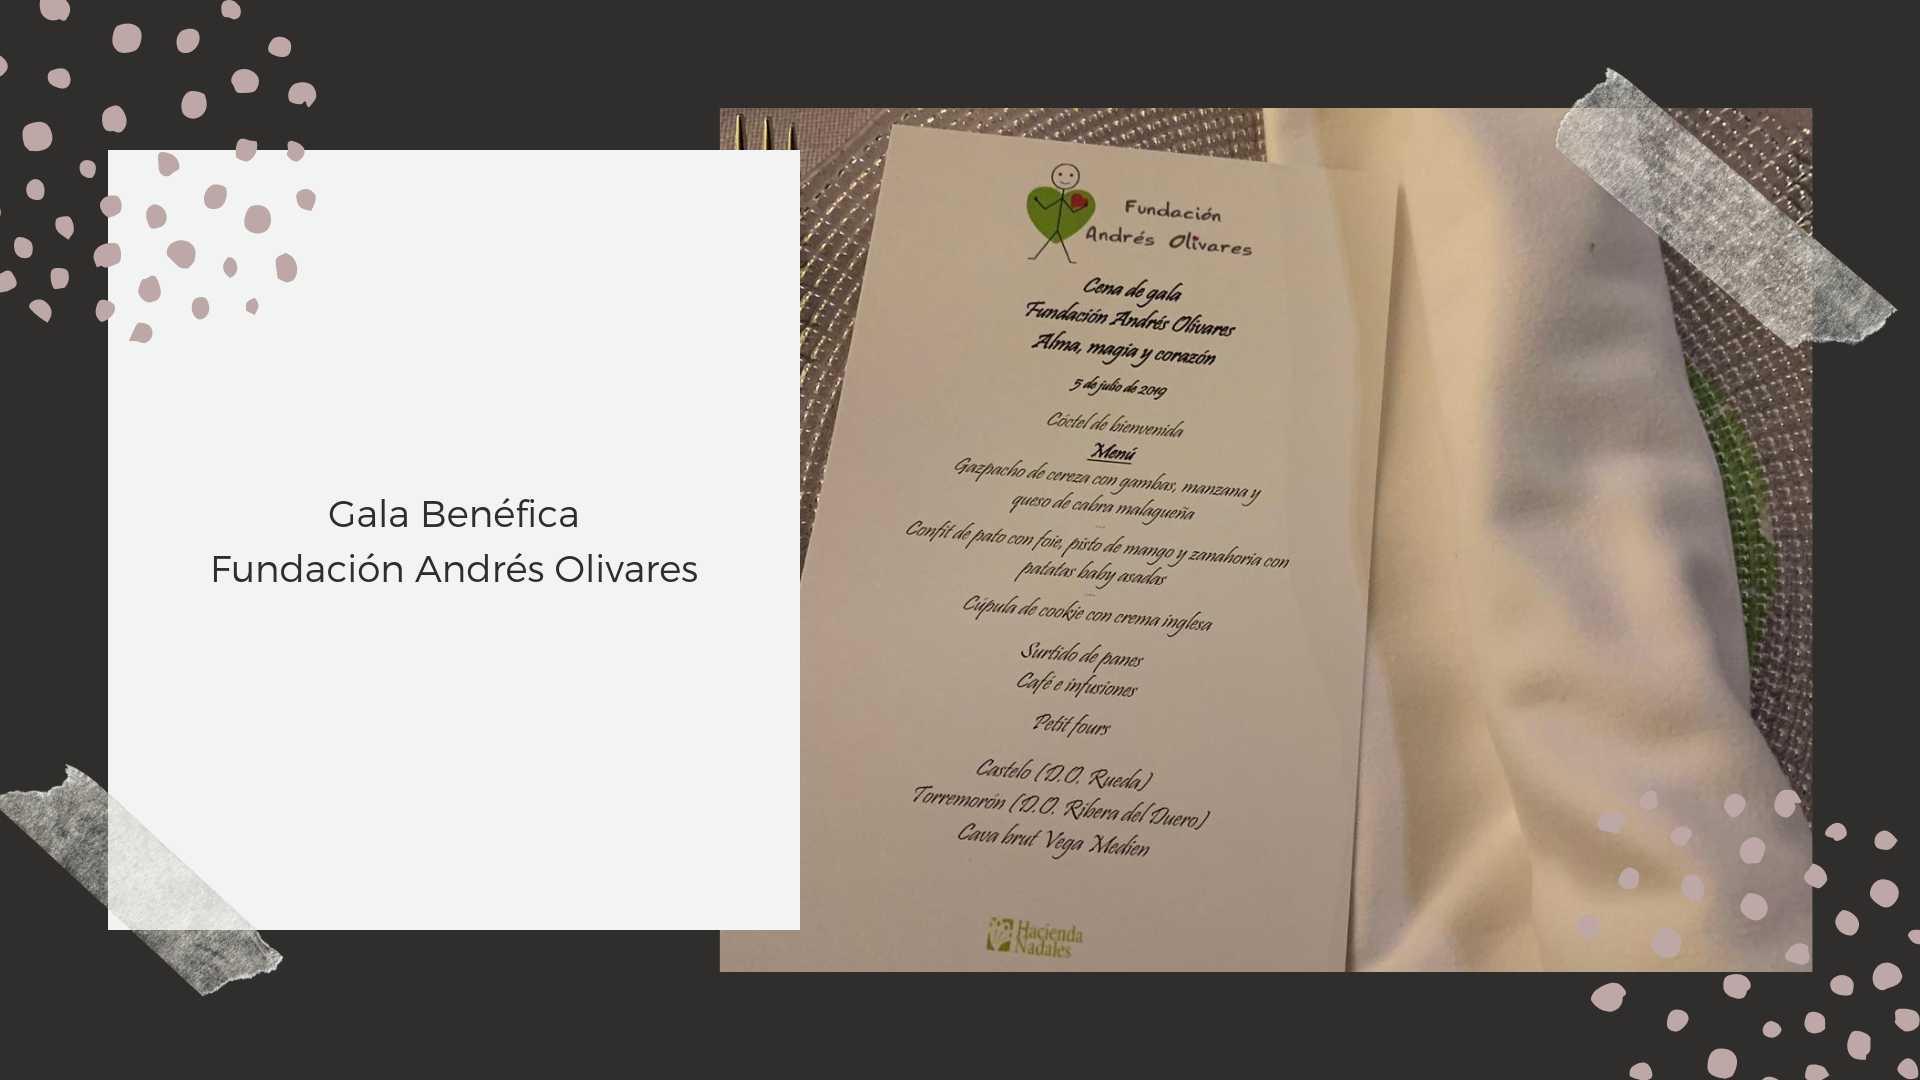 Gala benéfica Fundación Andrés Olivares